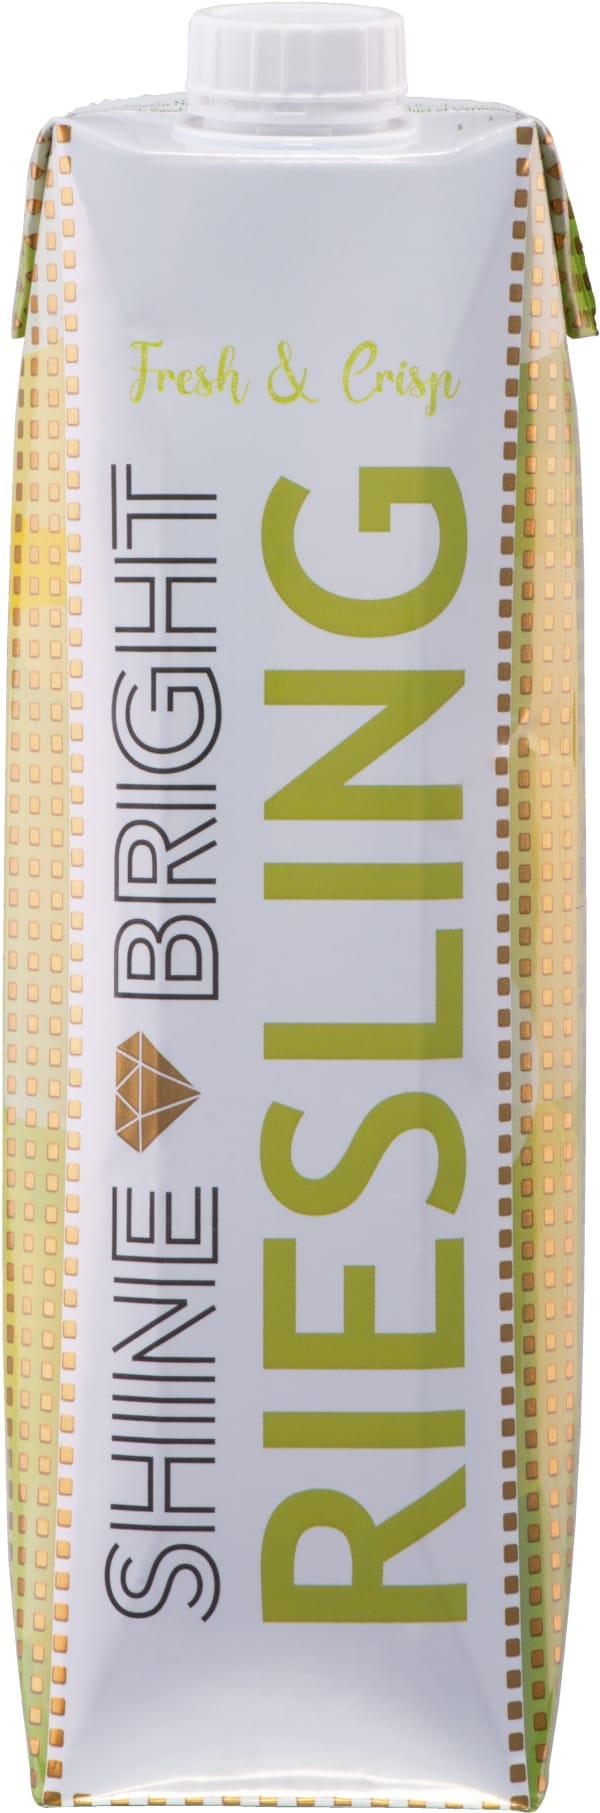 Shine Bright 2016 carton package